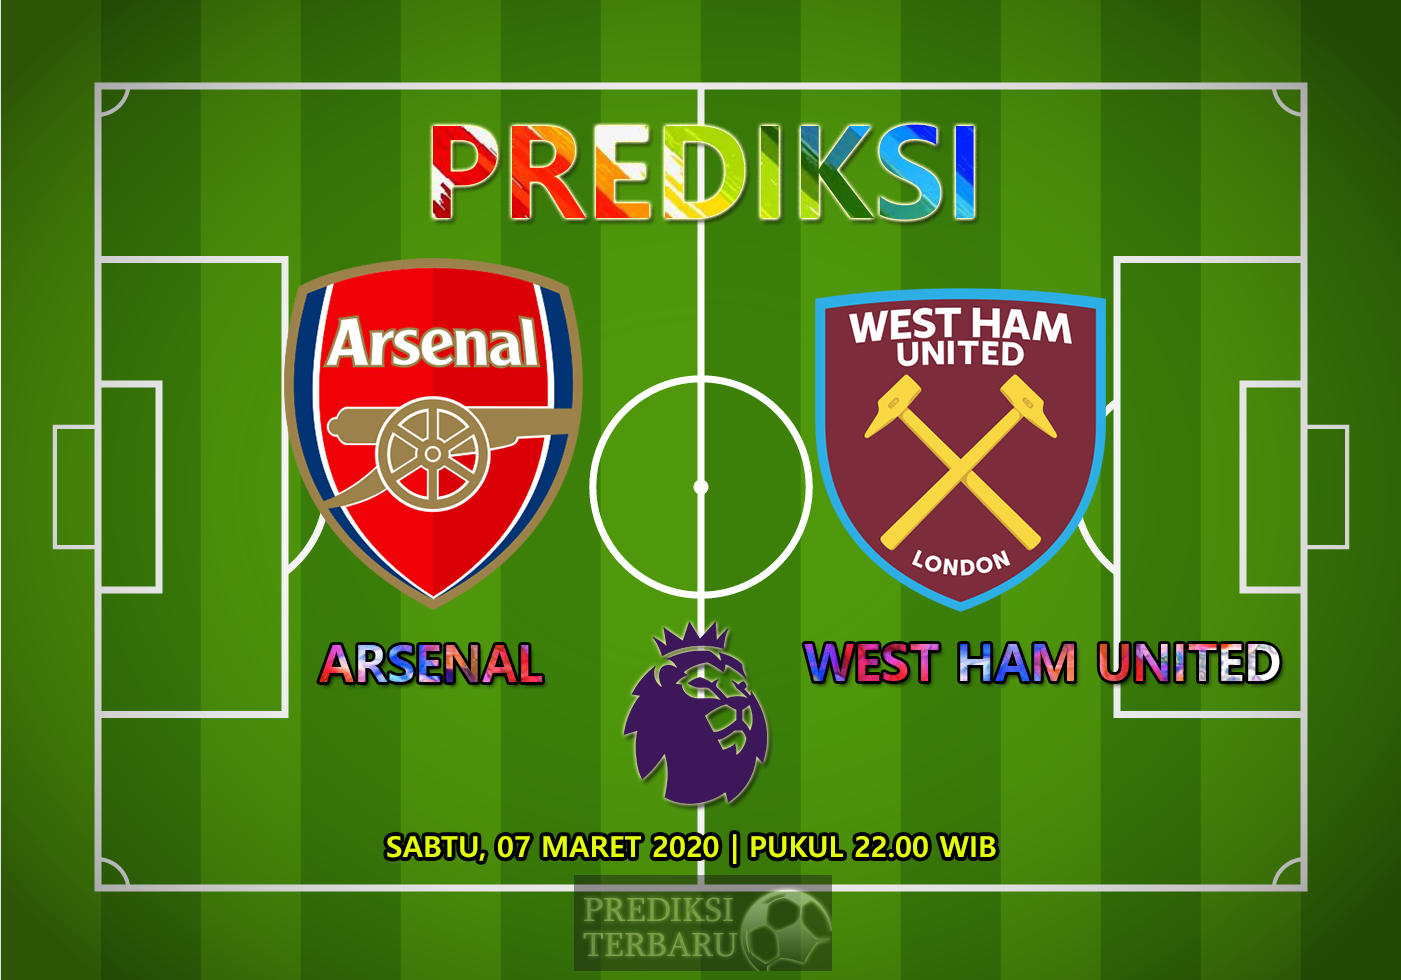 Prediksi Arsenal Vs West Ham United Sabtu 07 Maret